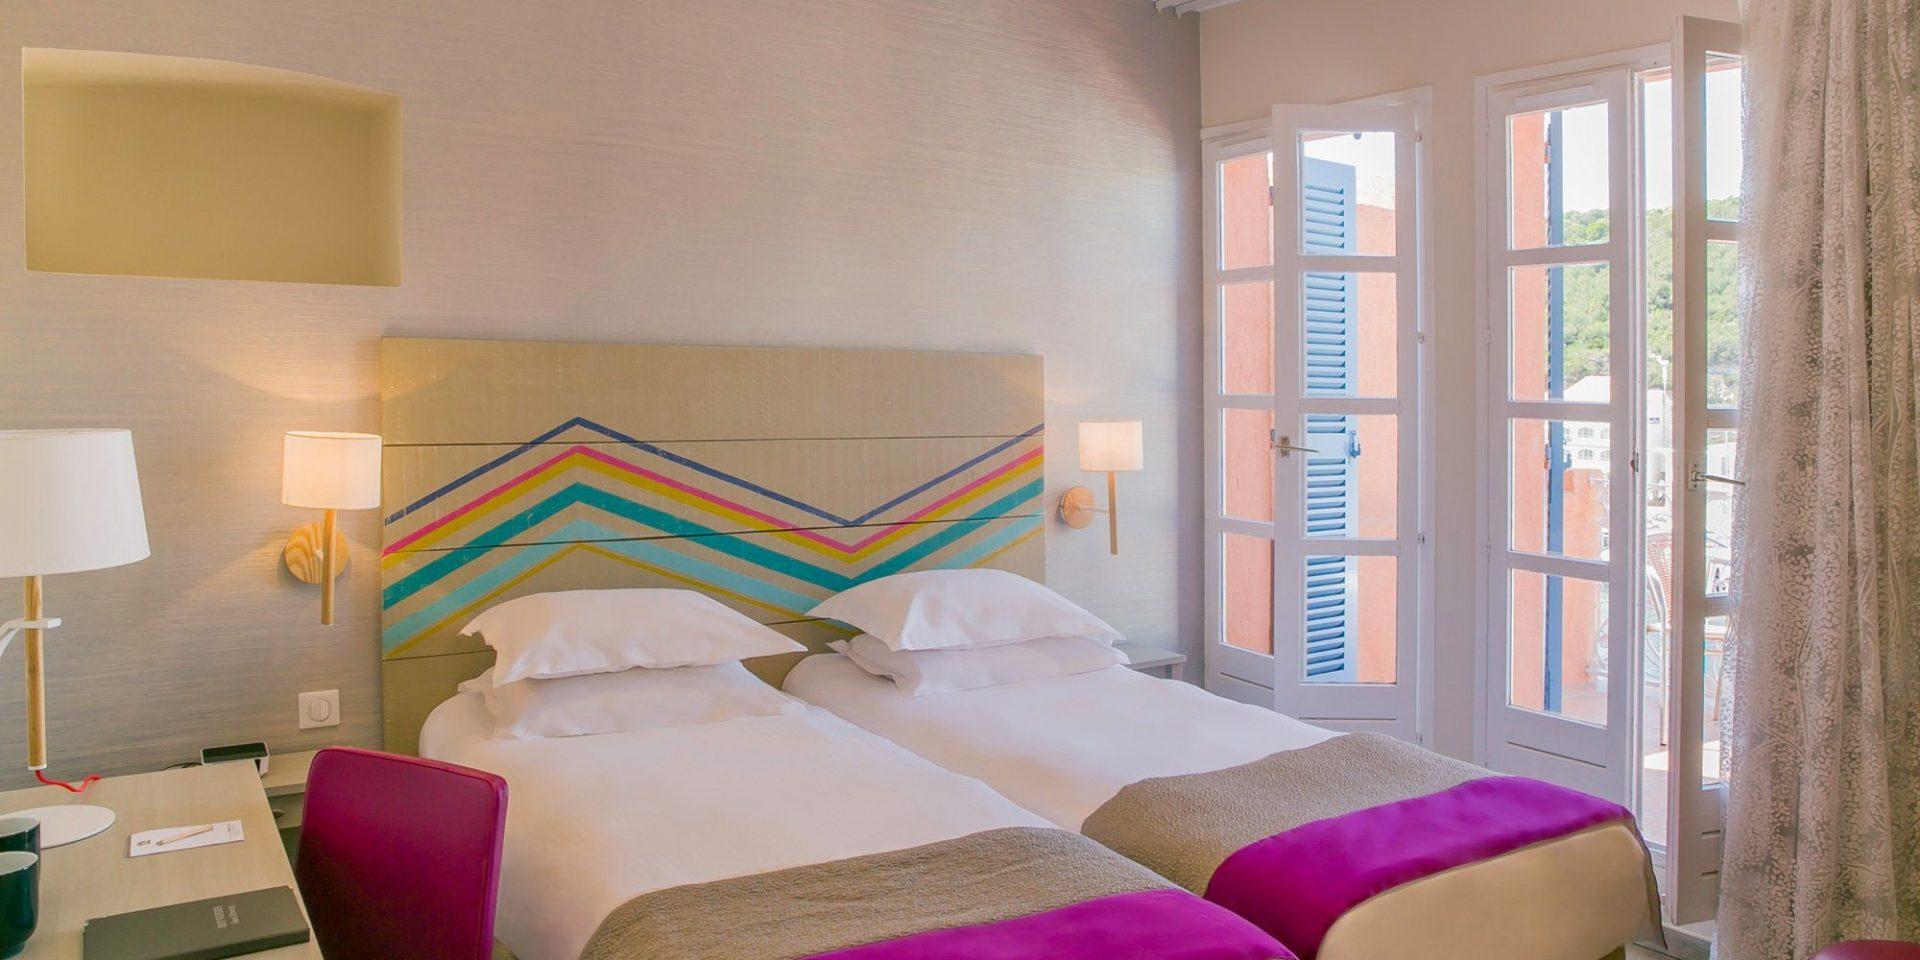 Best Western Hotel du Roy d'Aragon Bonifacio Corsica Frankrijk kamer-Privilège-terras-2-losse-bedden